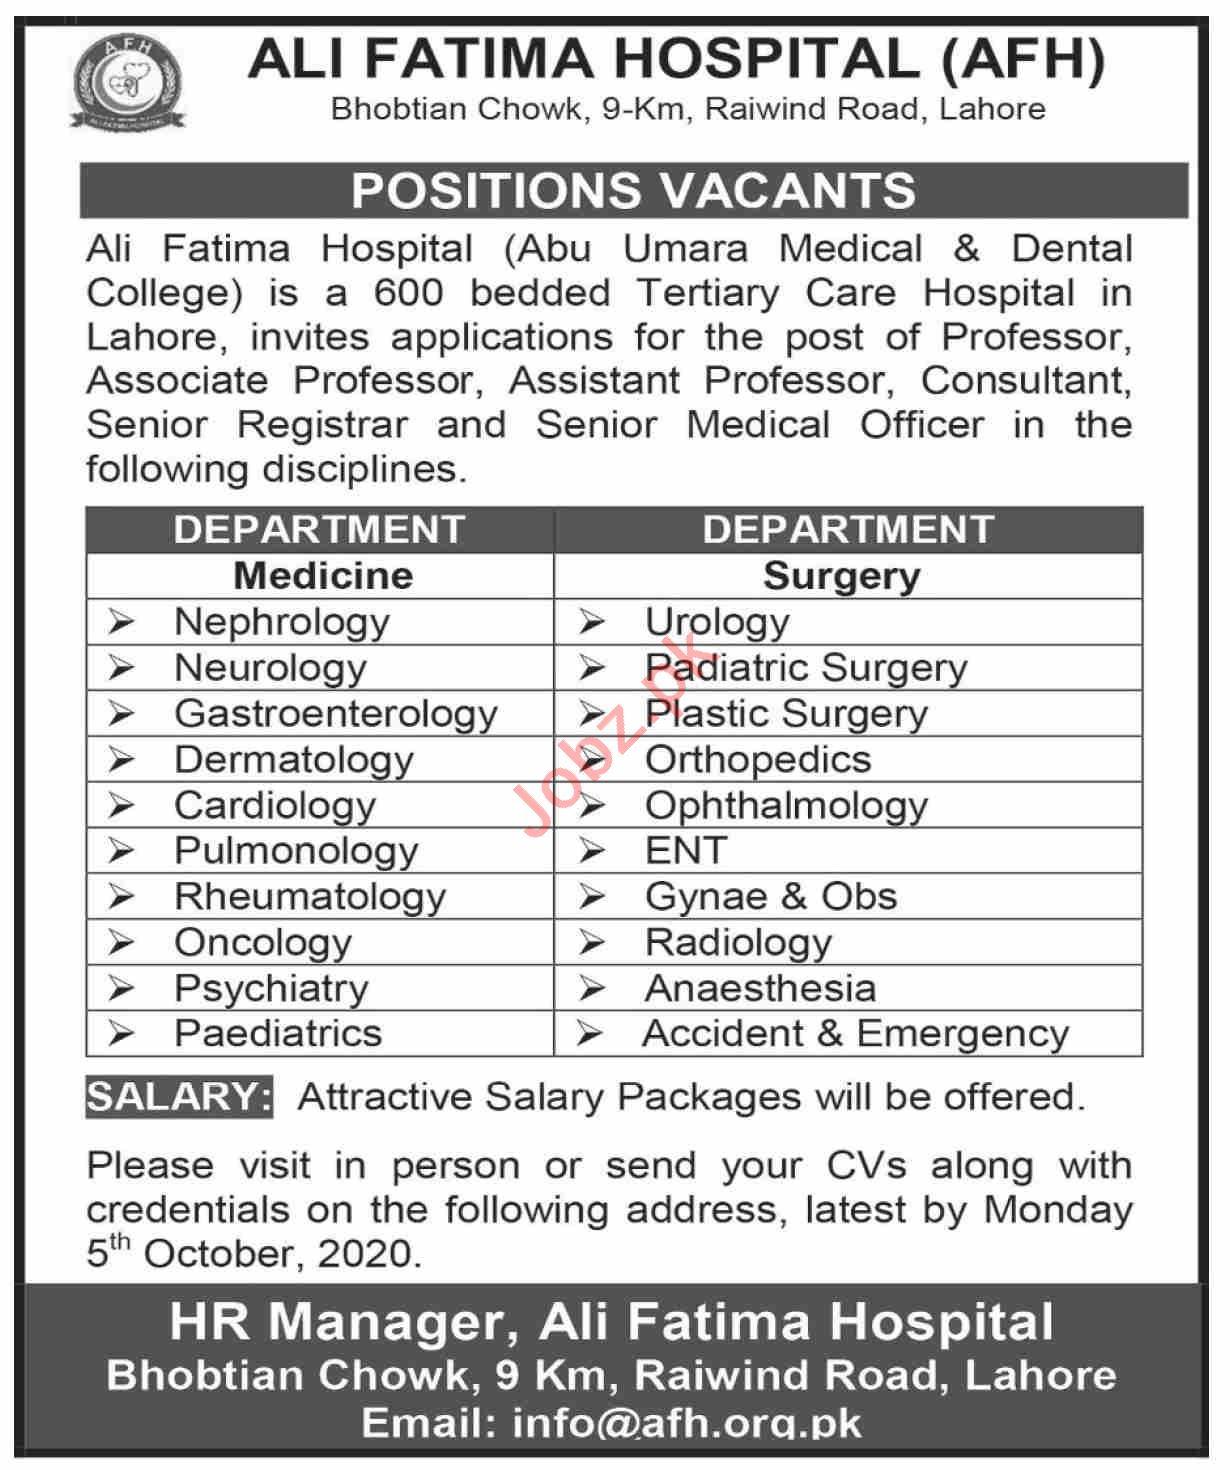 Professor & Lecturer Jobs in Ali Fatima Hospital AFH Lahore